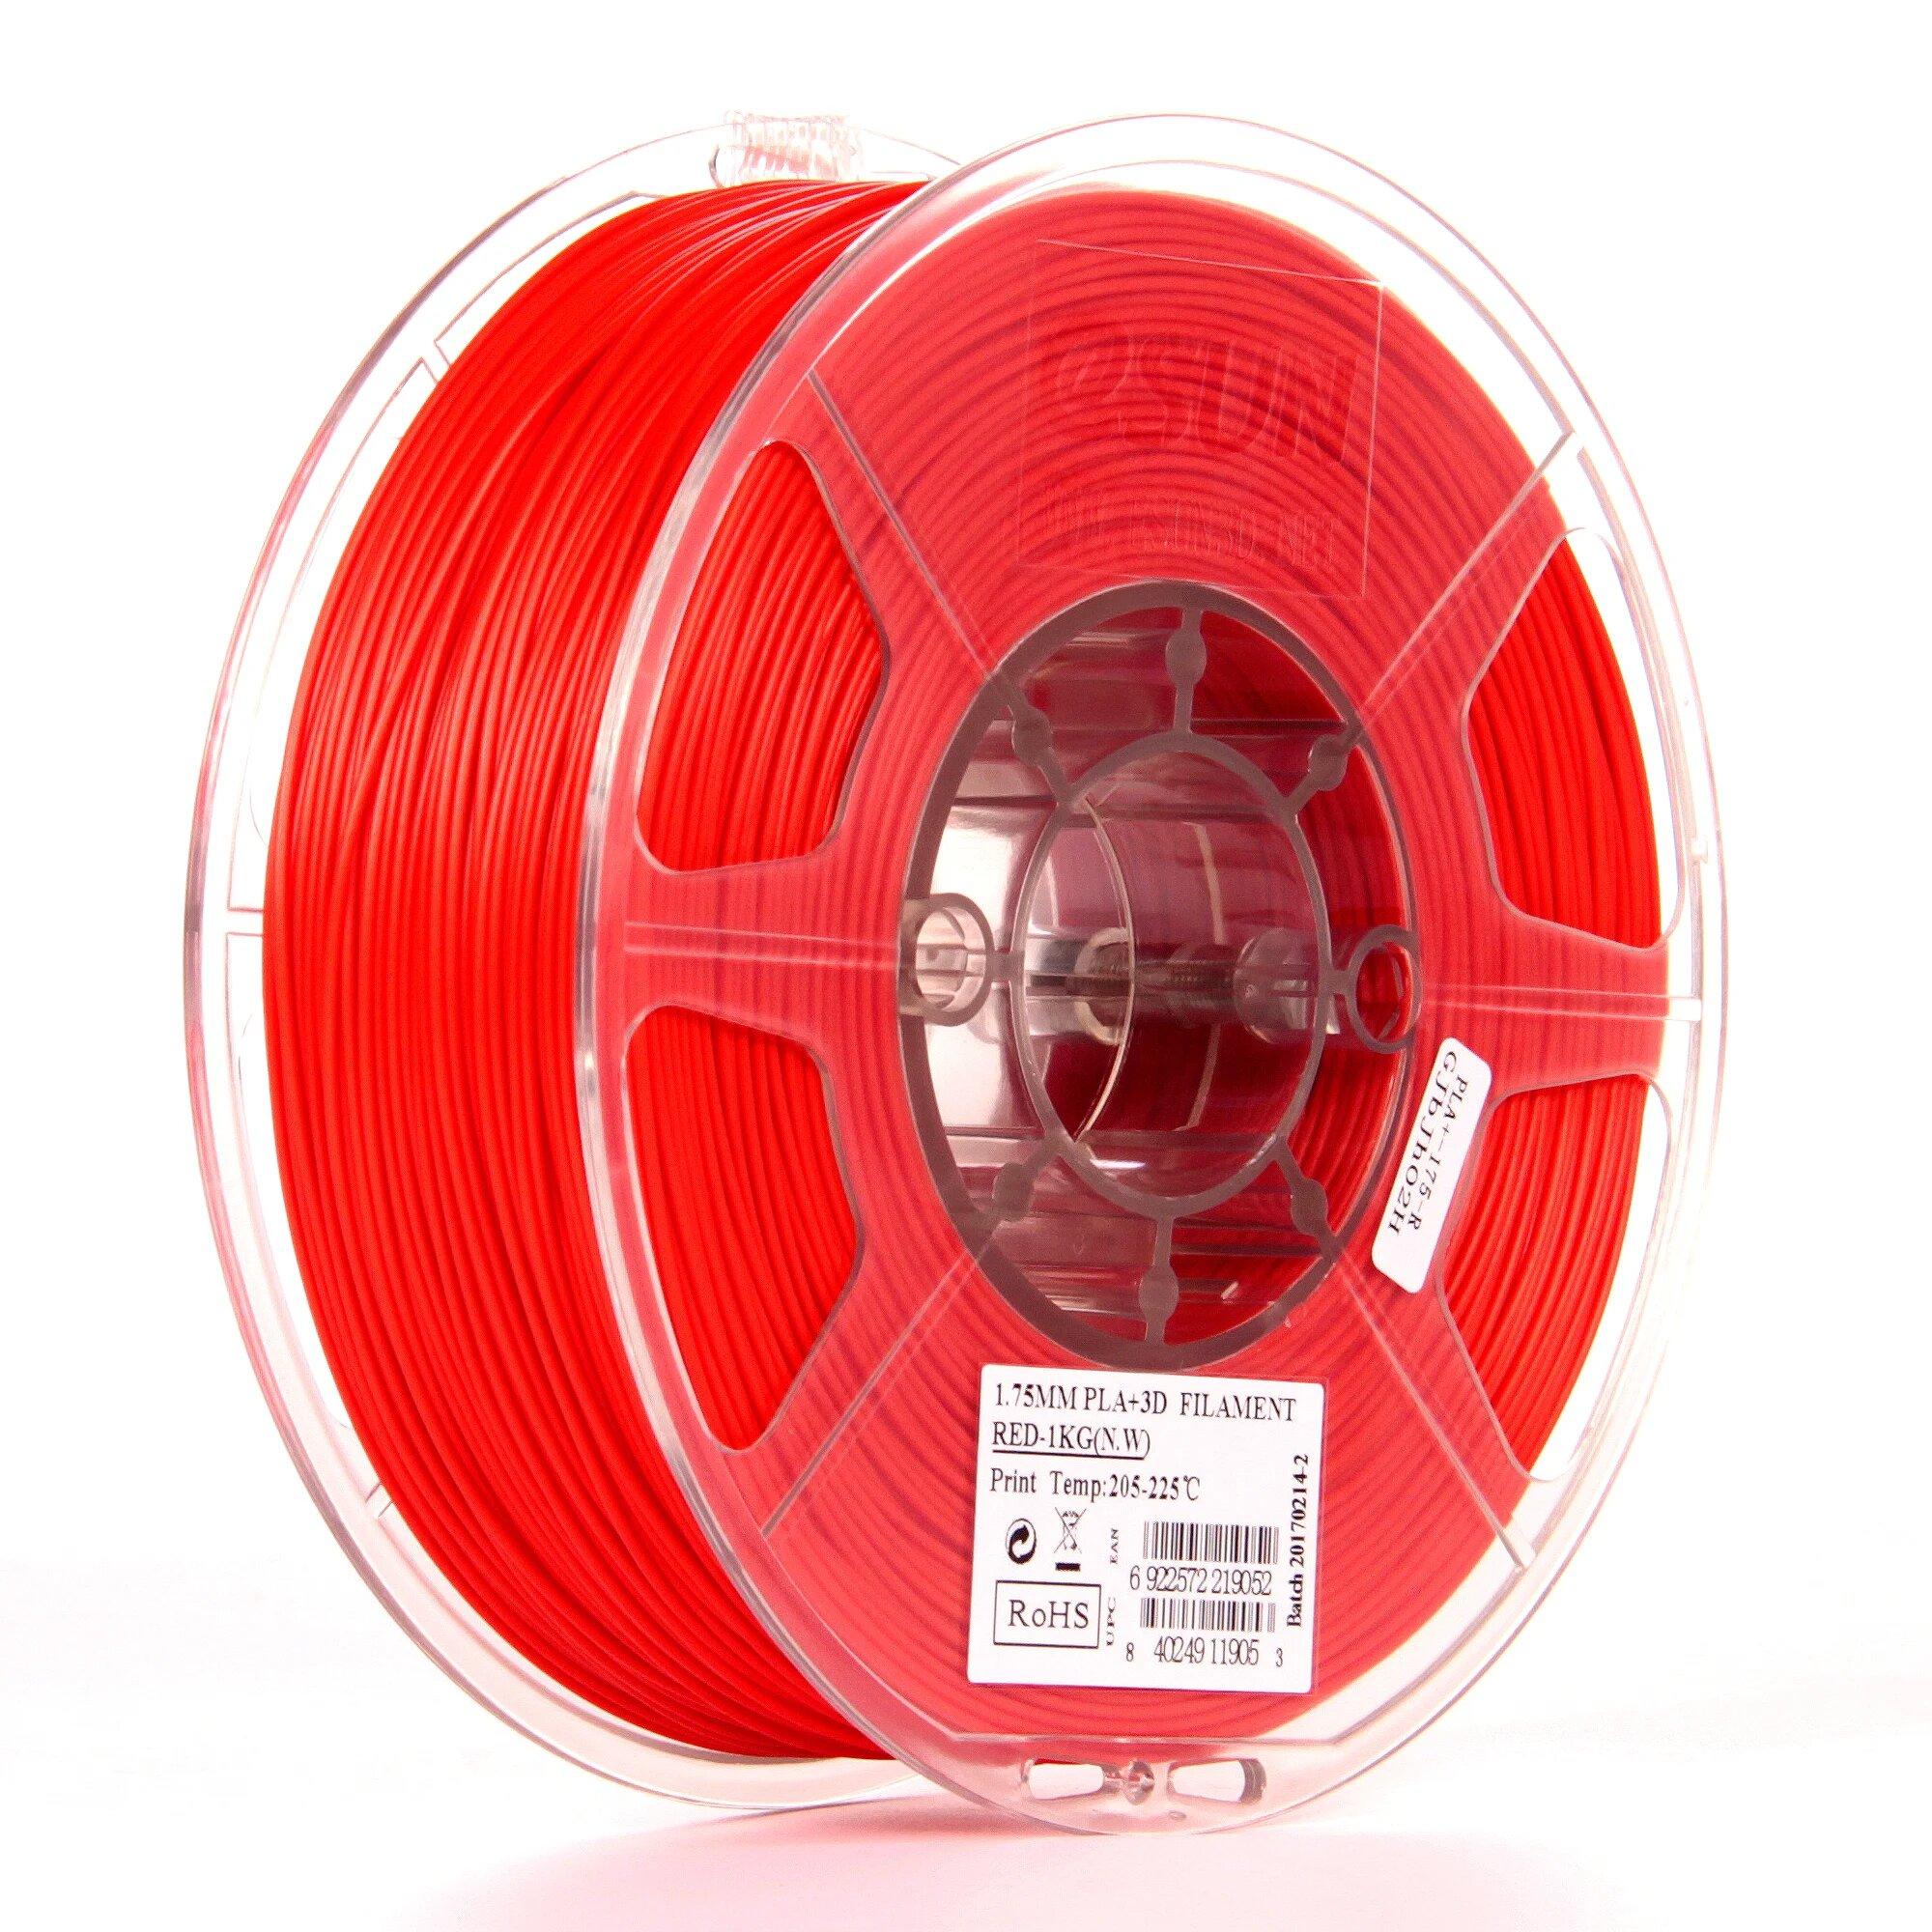 eSun Twinkling Filament Red